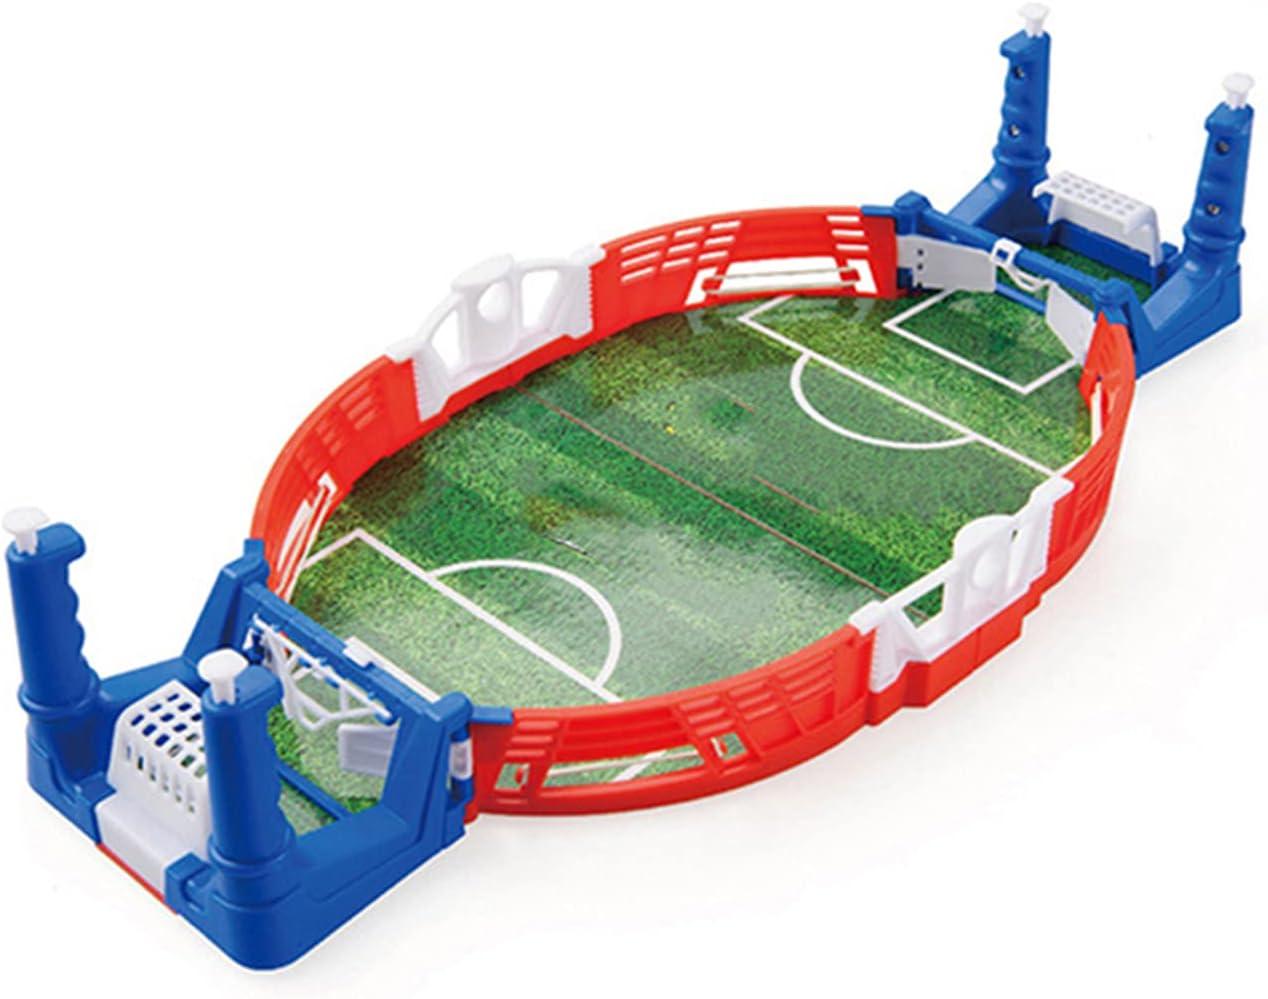 Mini Football San Francisco Mall Interactive Table Max 76% OFF De Miniature Arcade Game-Classic